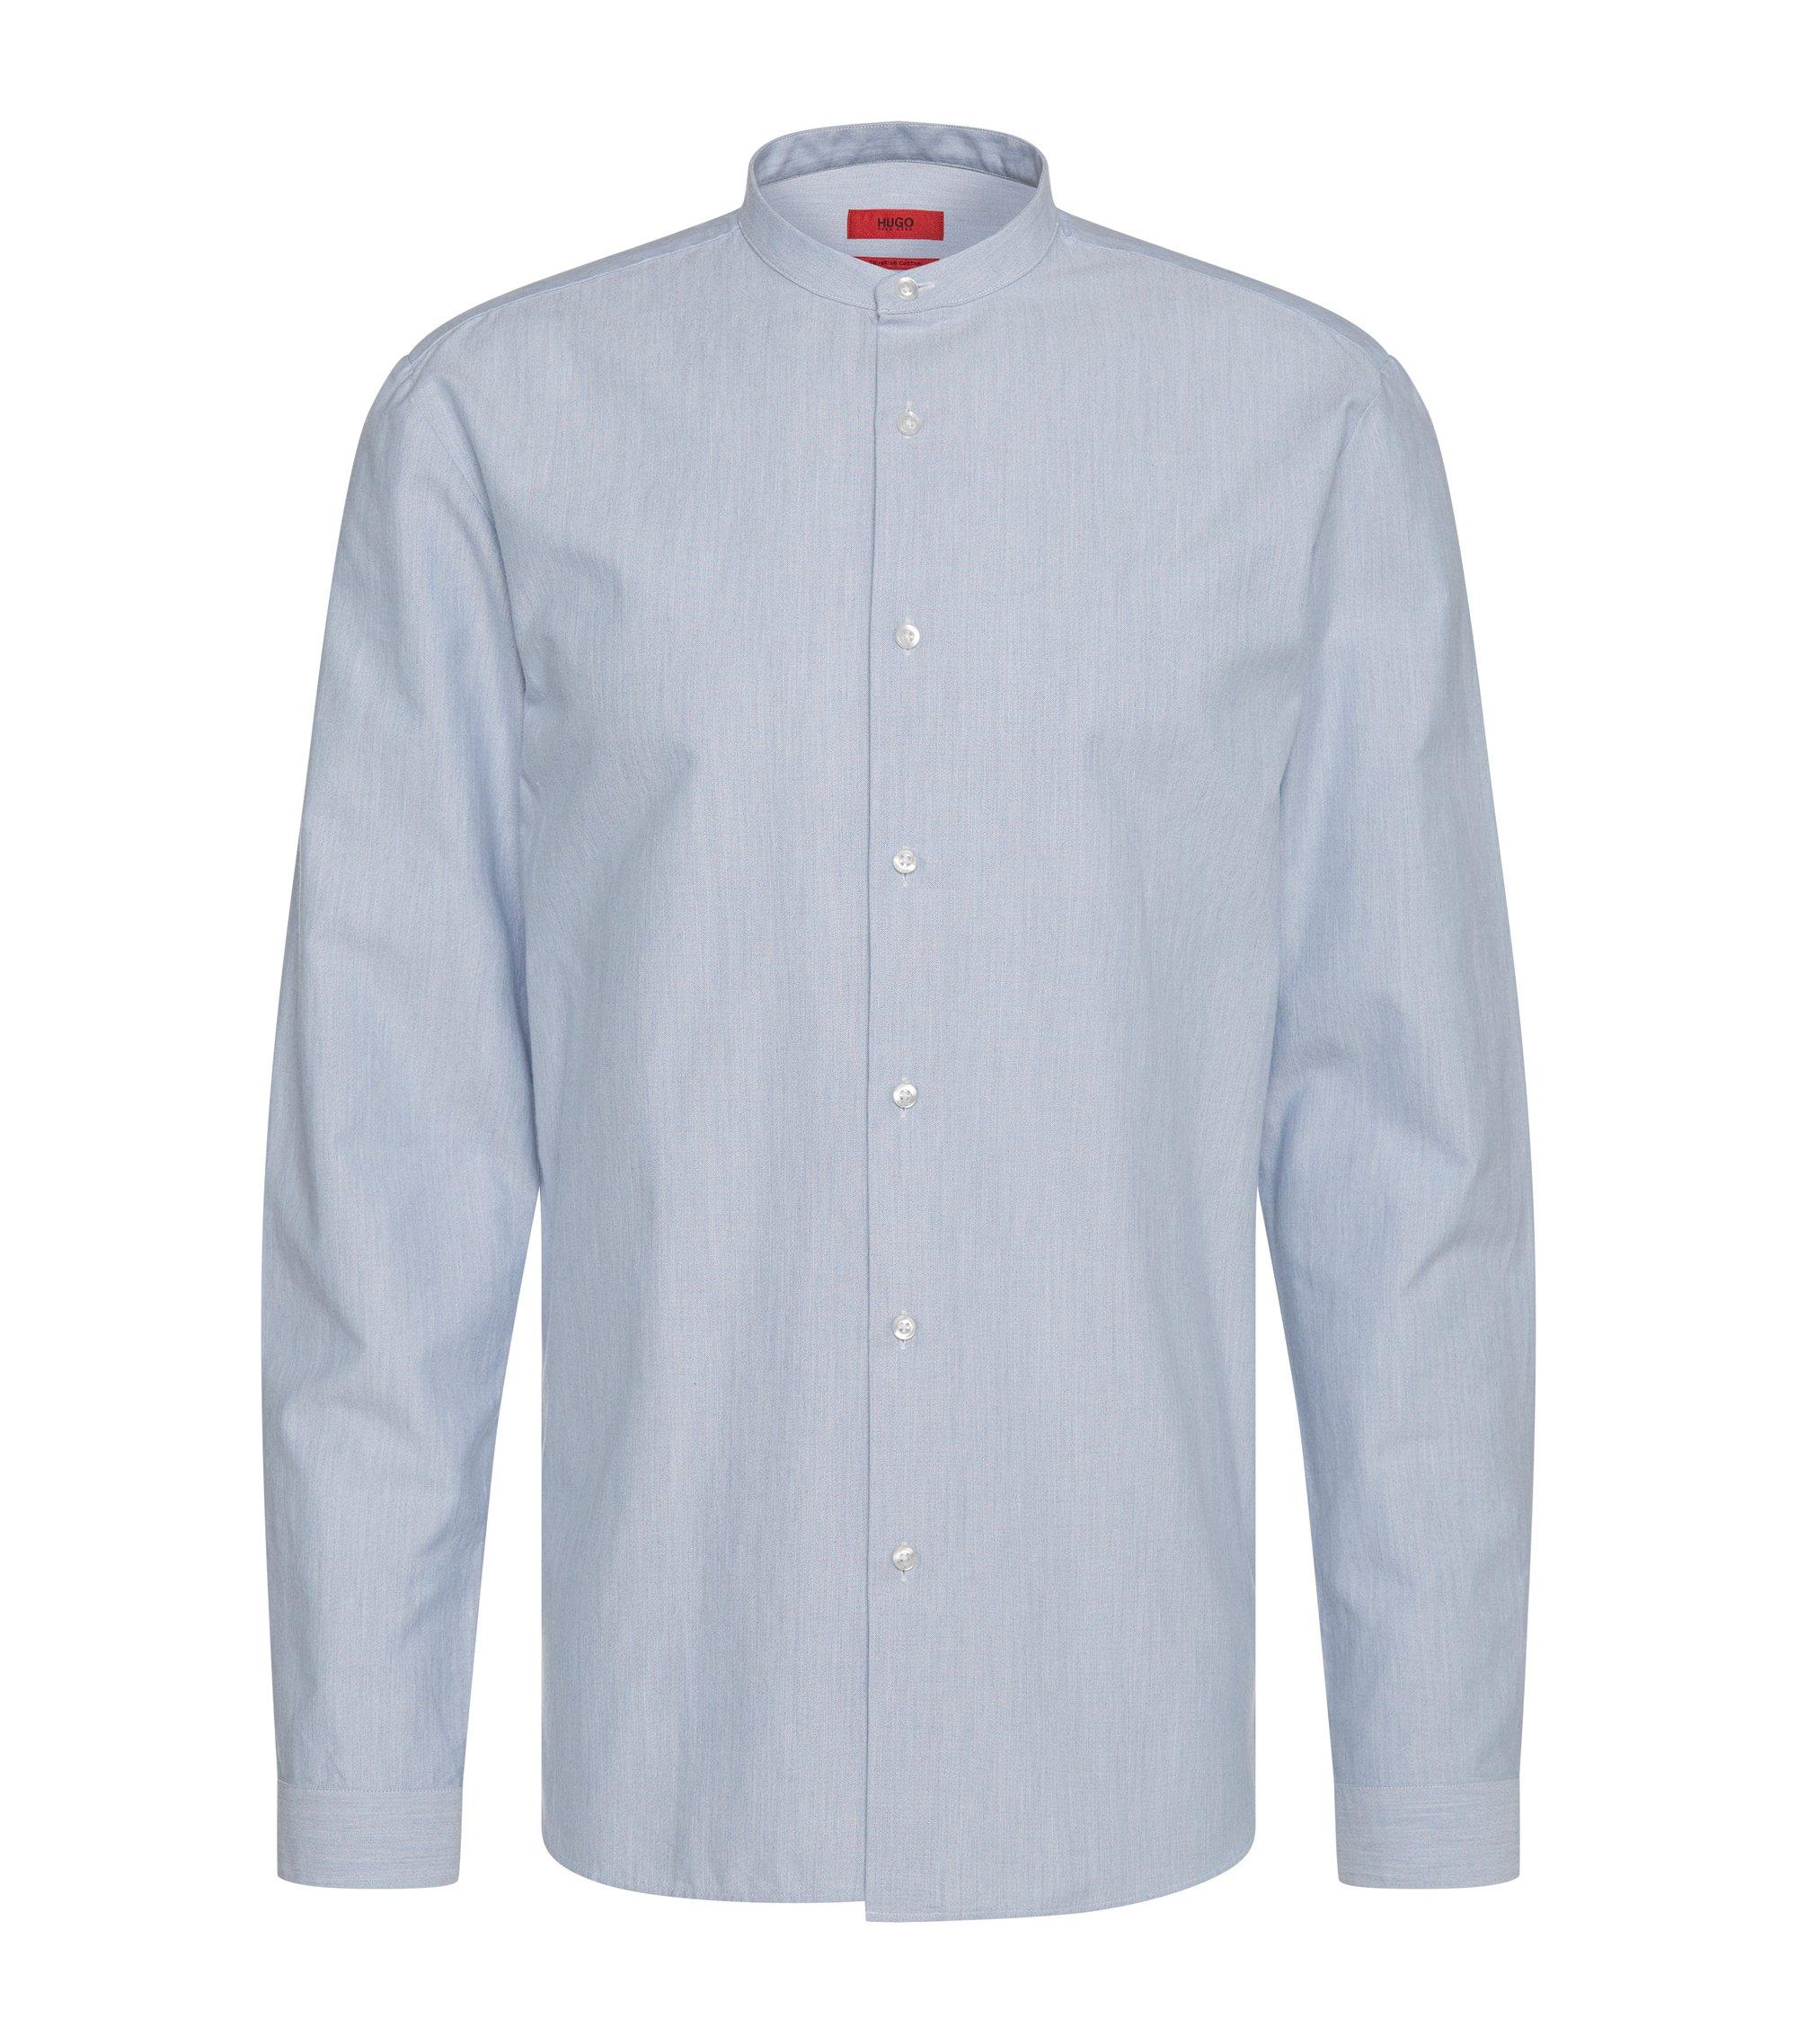 Cotton Button Down Shirt, Regular Fit | Eddison, Light Blue